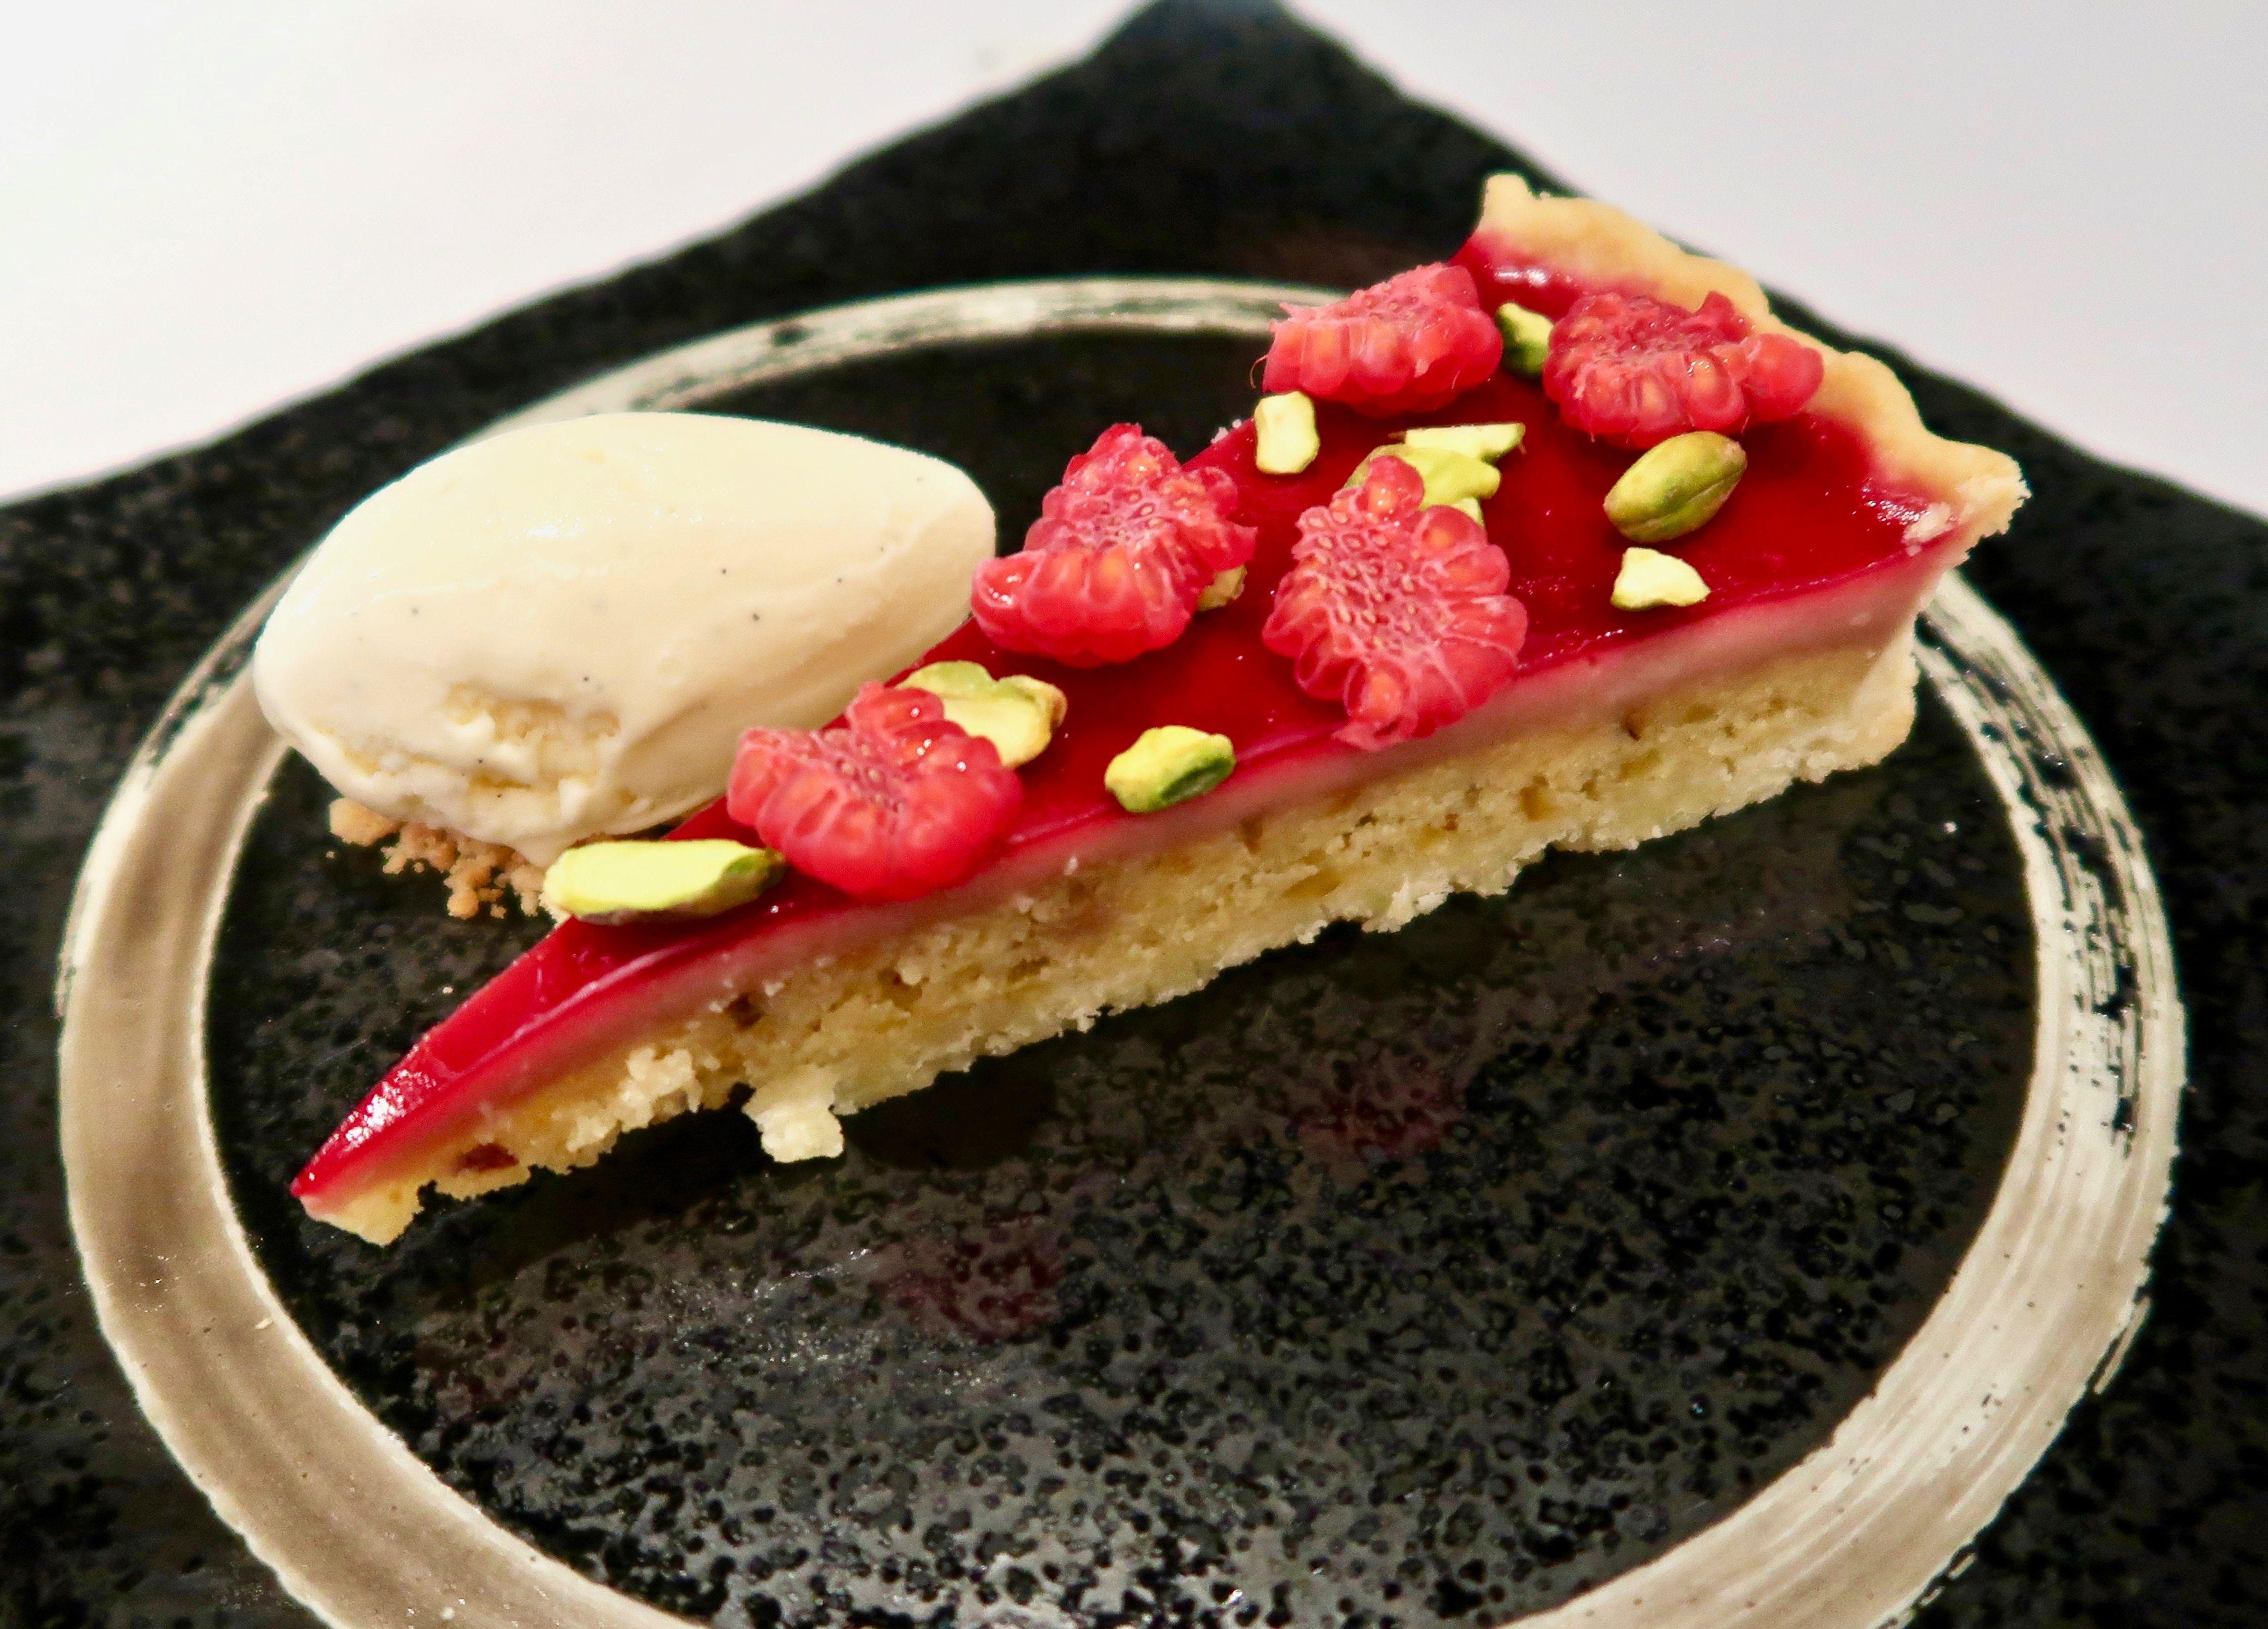 Cilantro Restaurant Wine Bar Micasa All Suites Hotel Kuala Lumpur With Images Sugar Cravings Food Food Blog